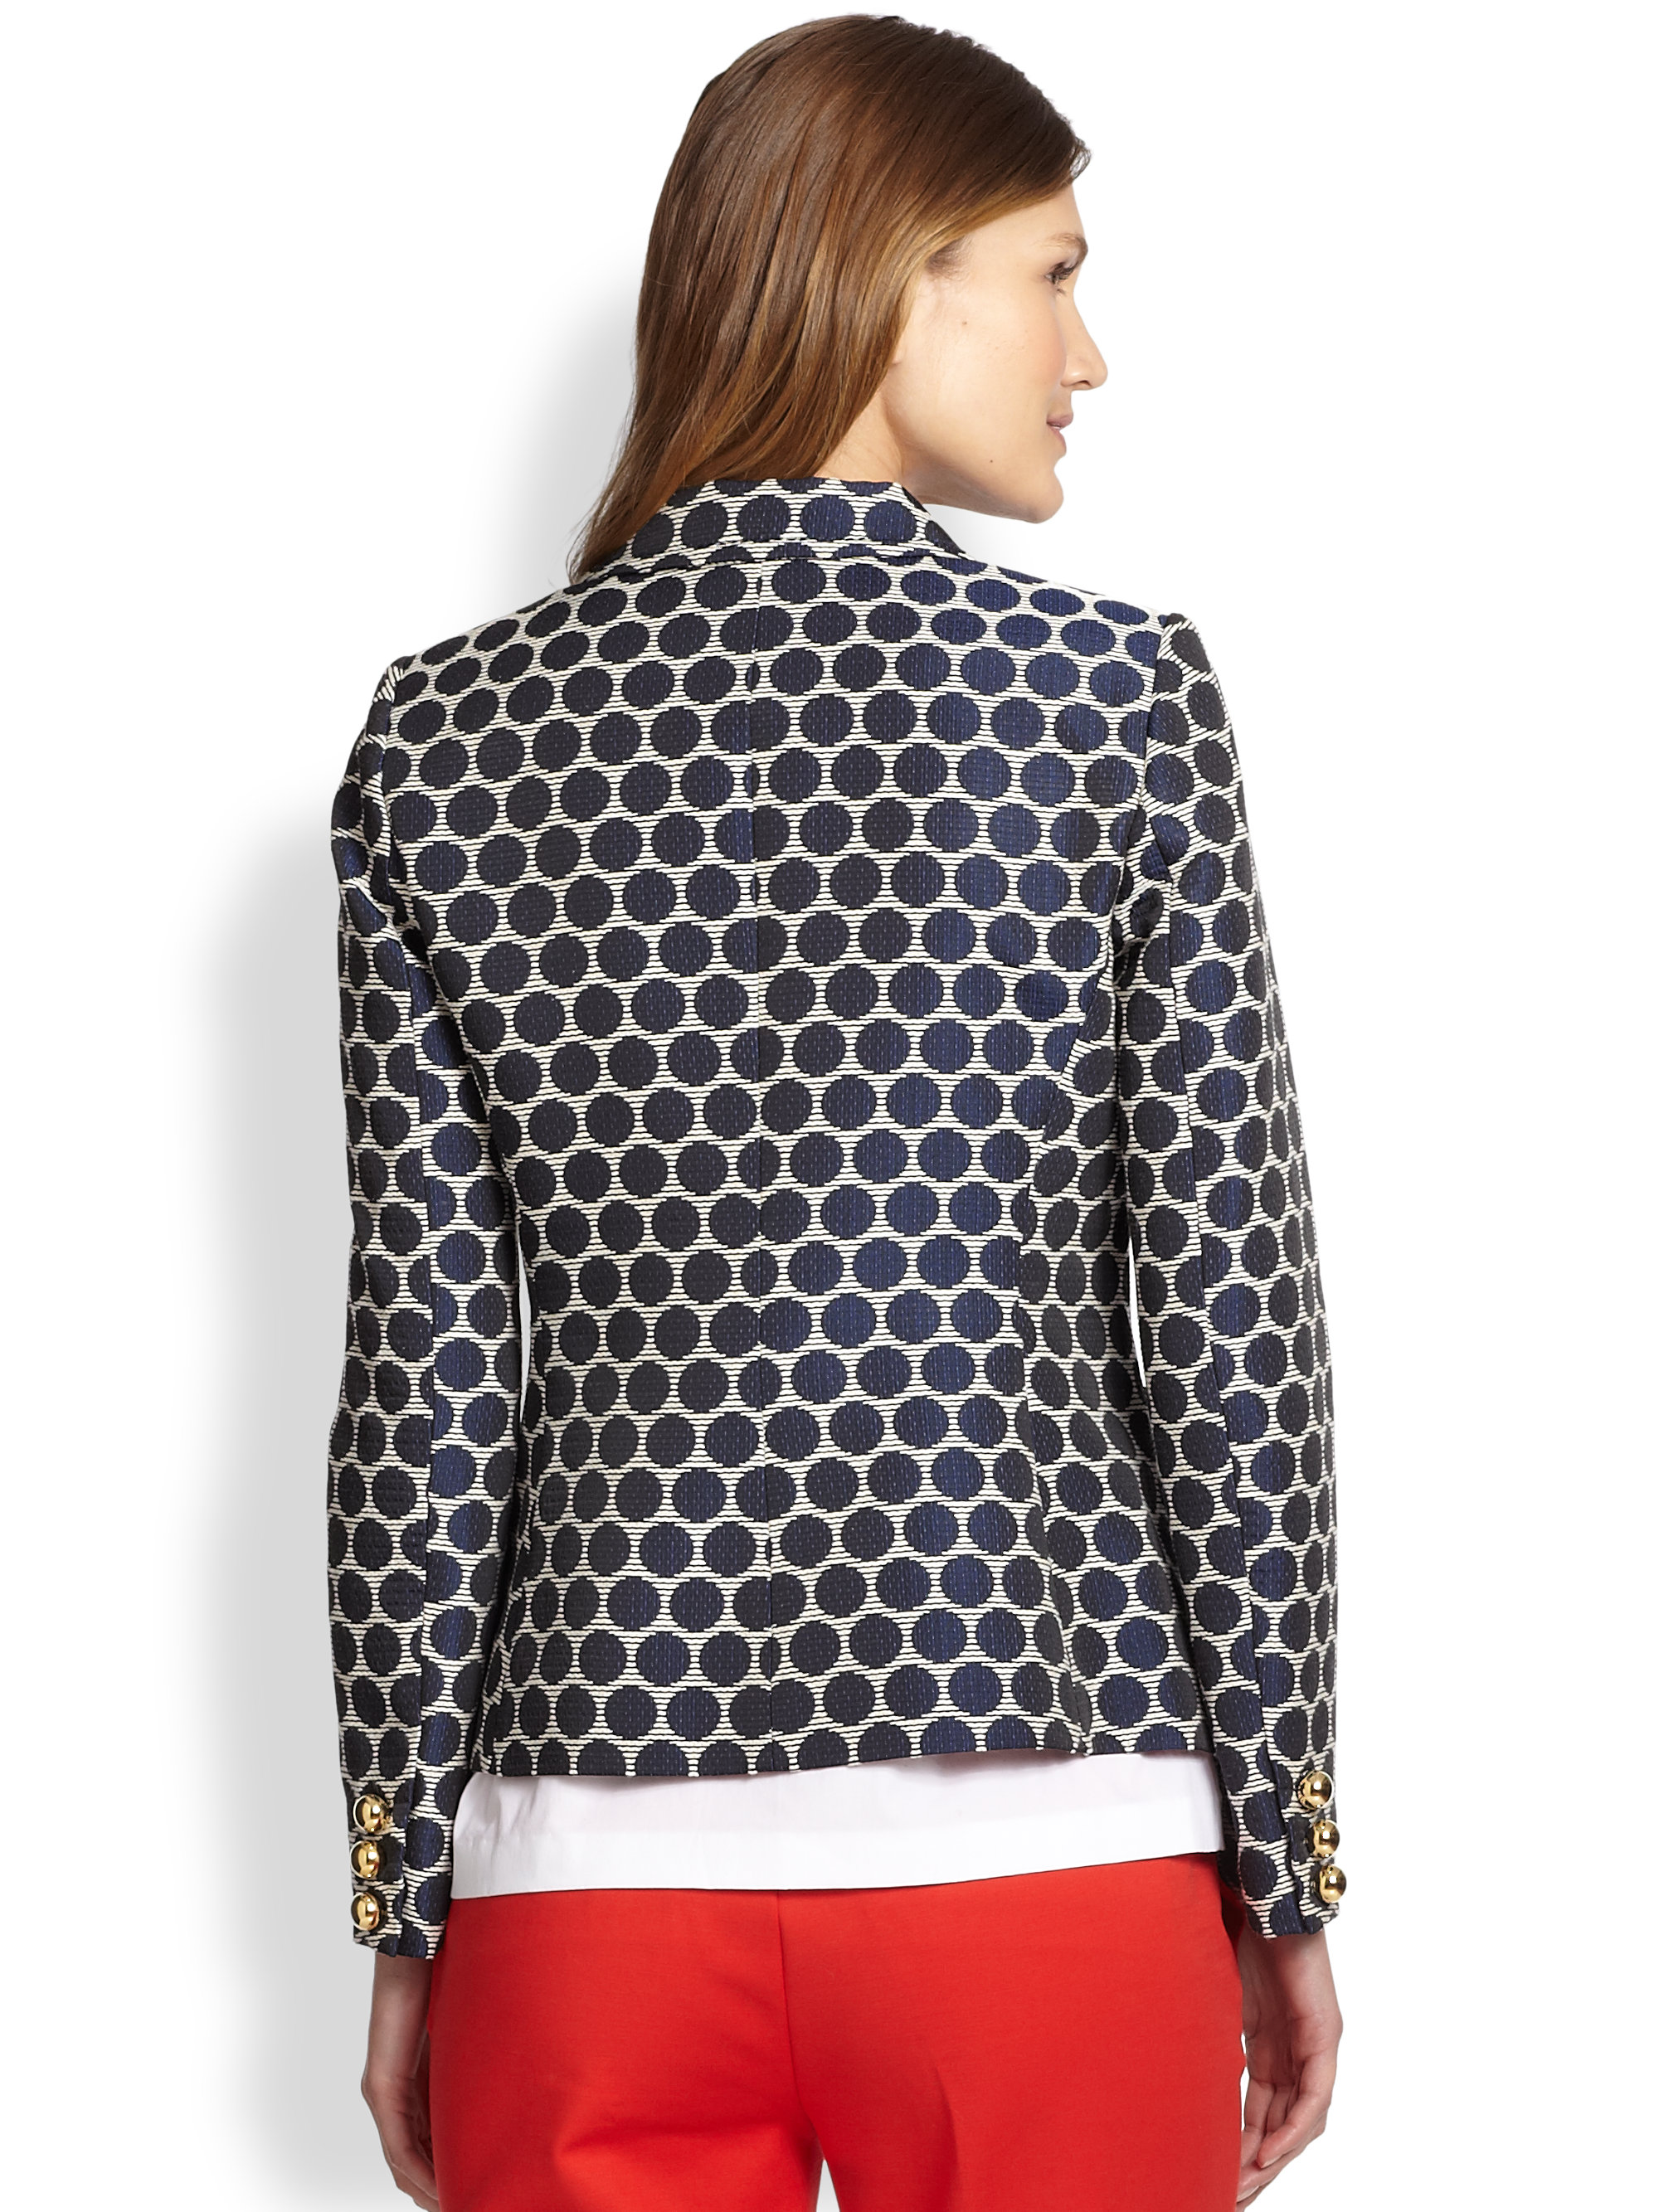 Kate spade new york Millie Patterned Blazer in Blue | Lyst